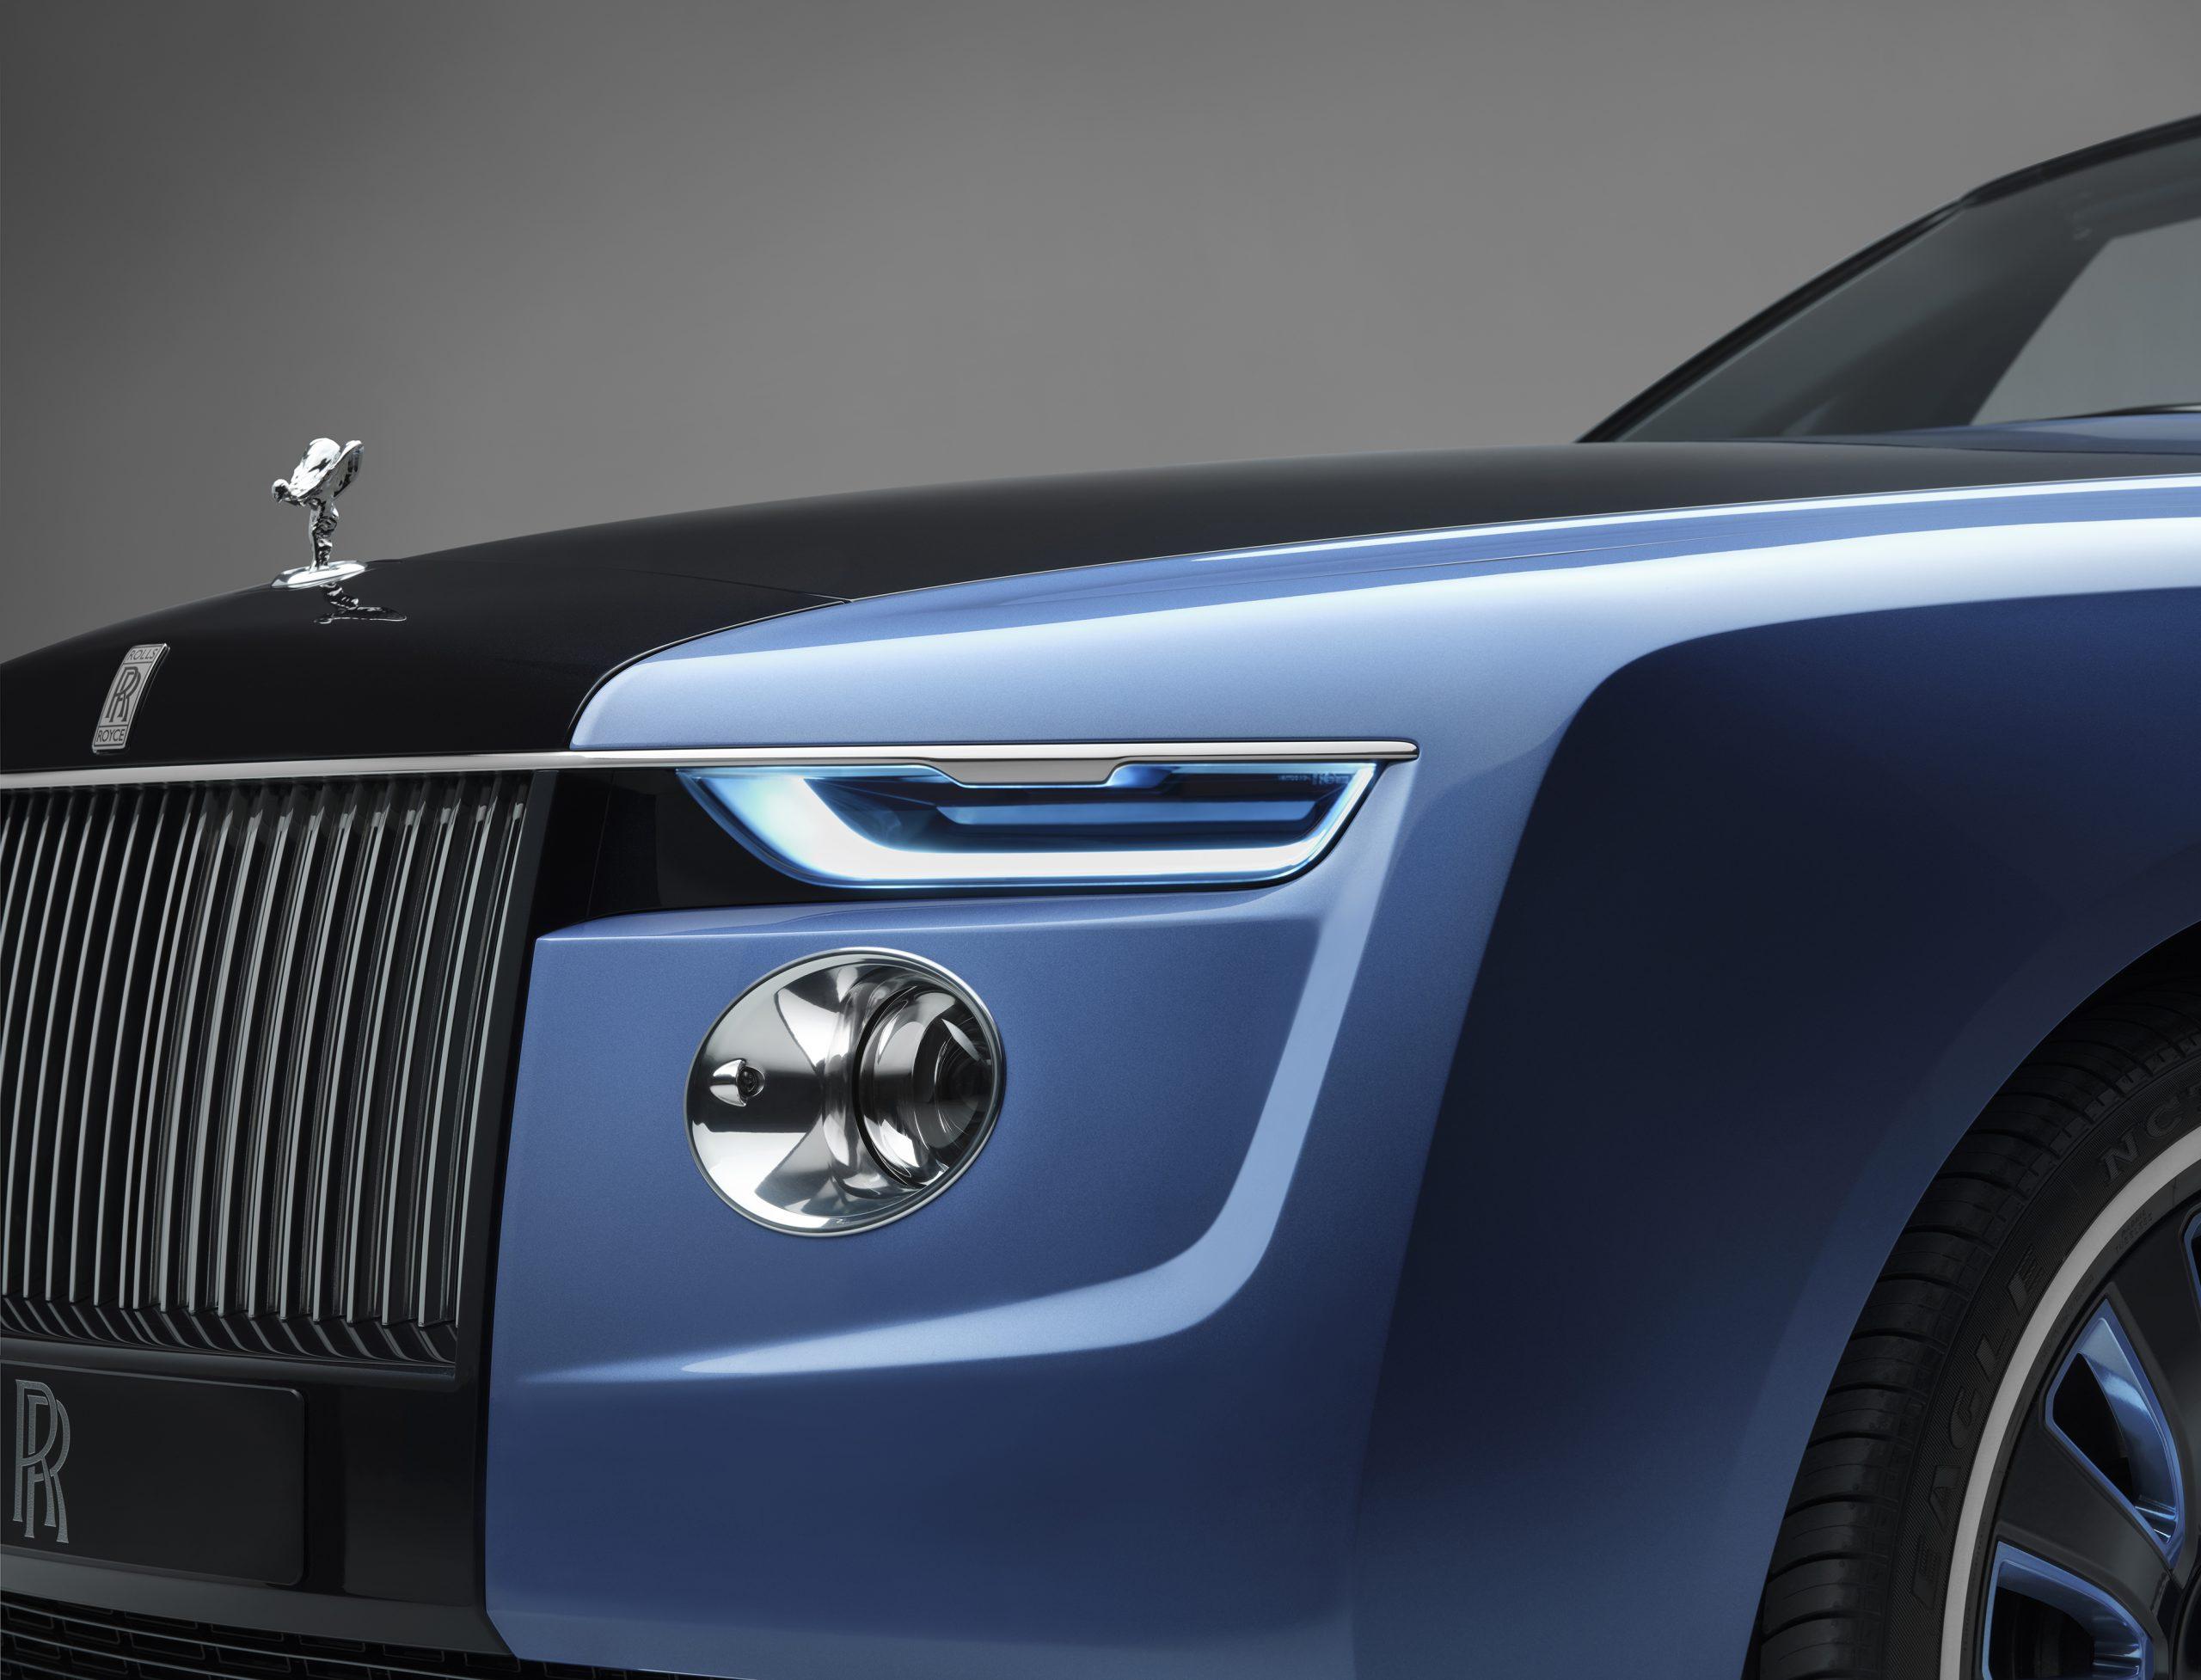 Rolls-RoyceBoatTailFrontCornerDetail